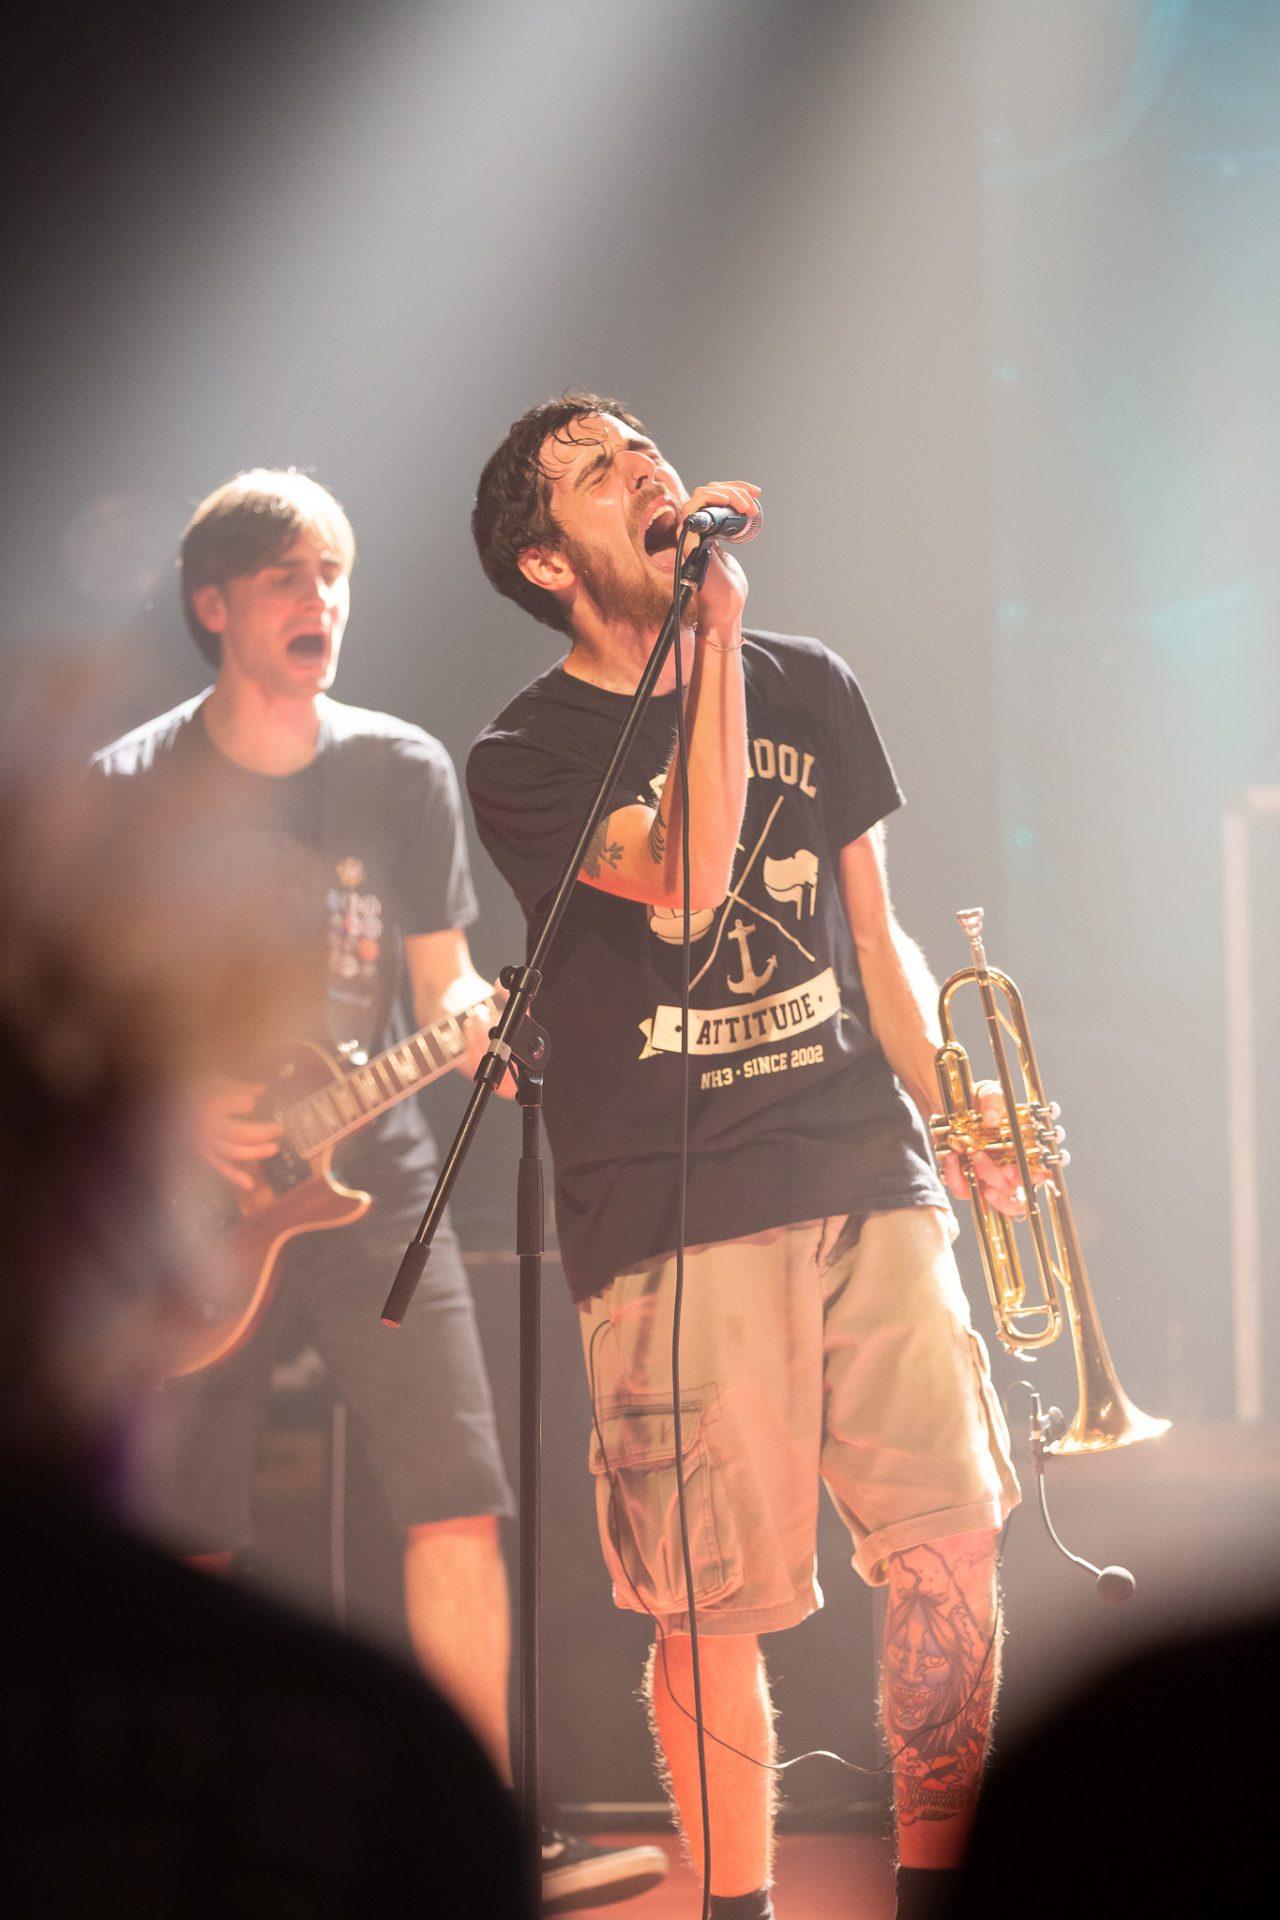 NH3 - Trompeter singt